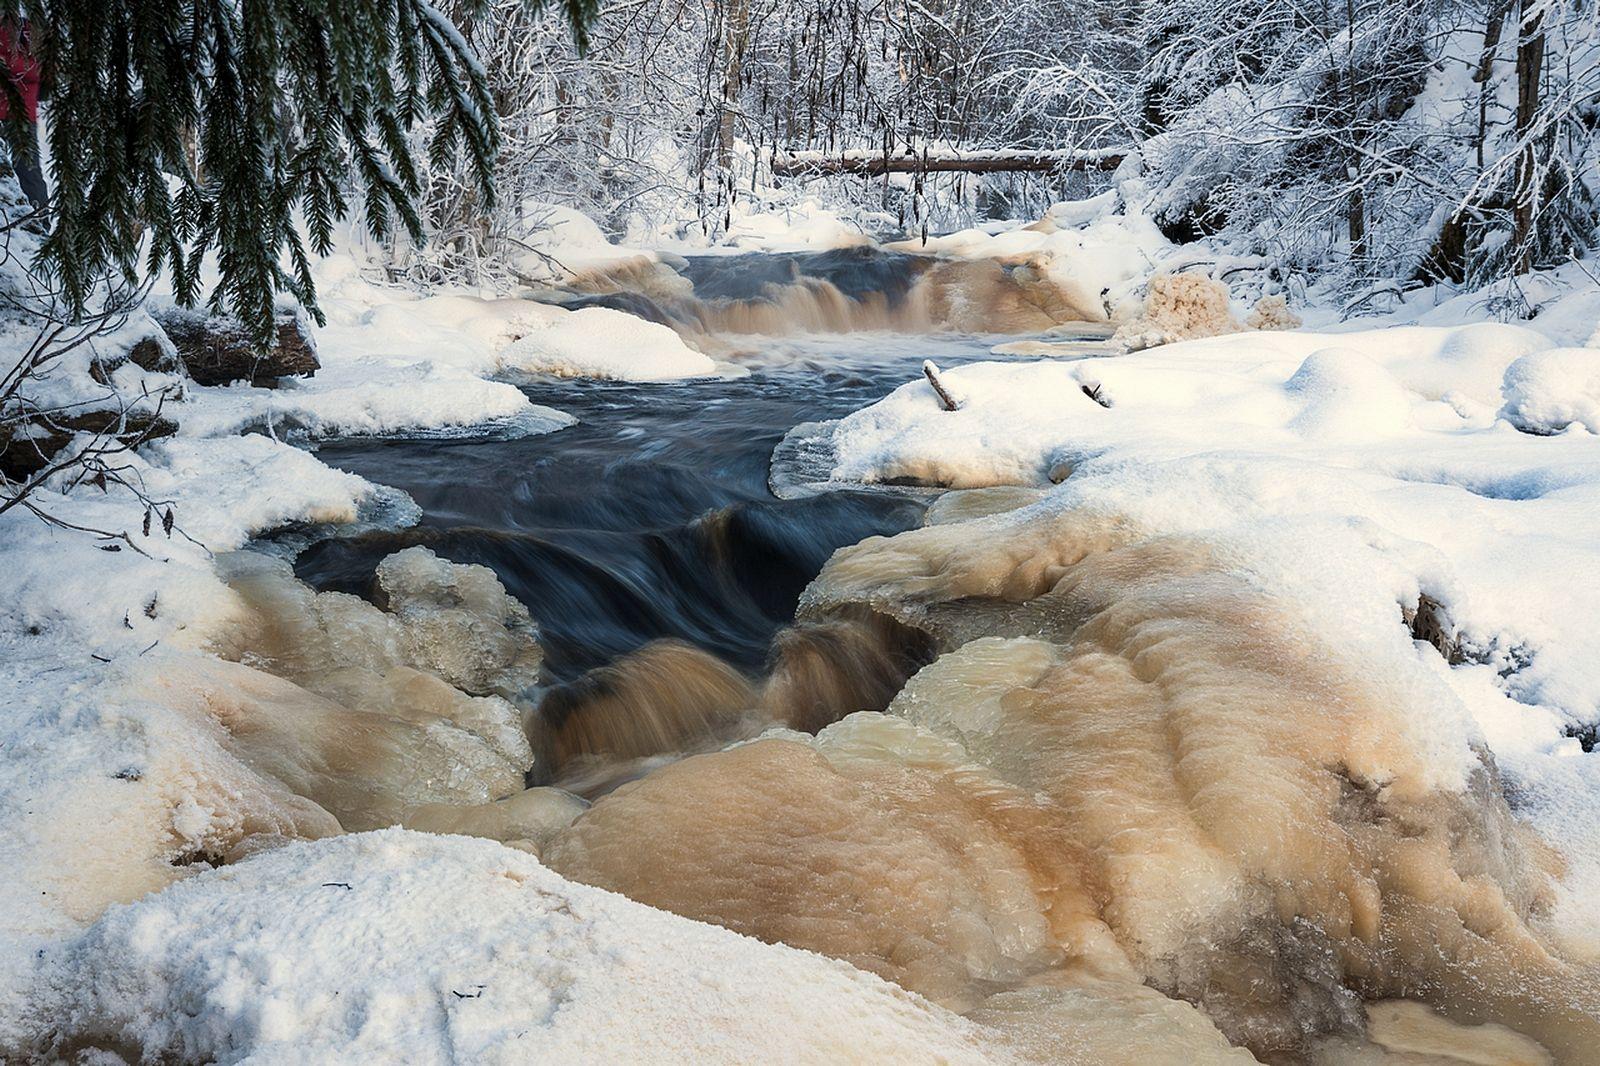 Река Тохмайоки. Карелия. Река Тохмайоки Карелия Зима